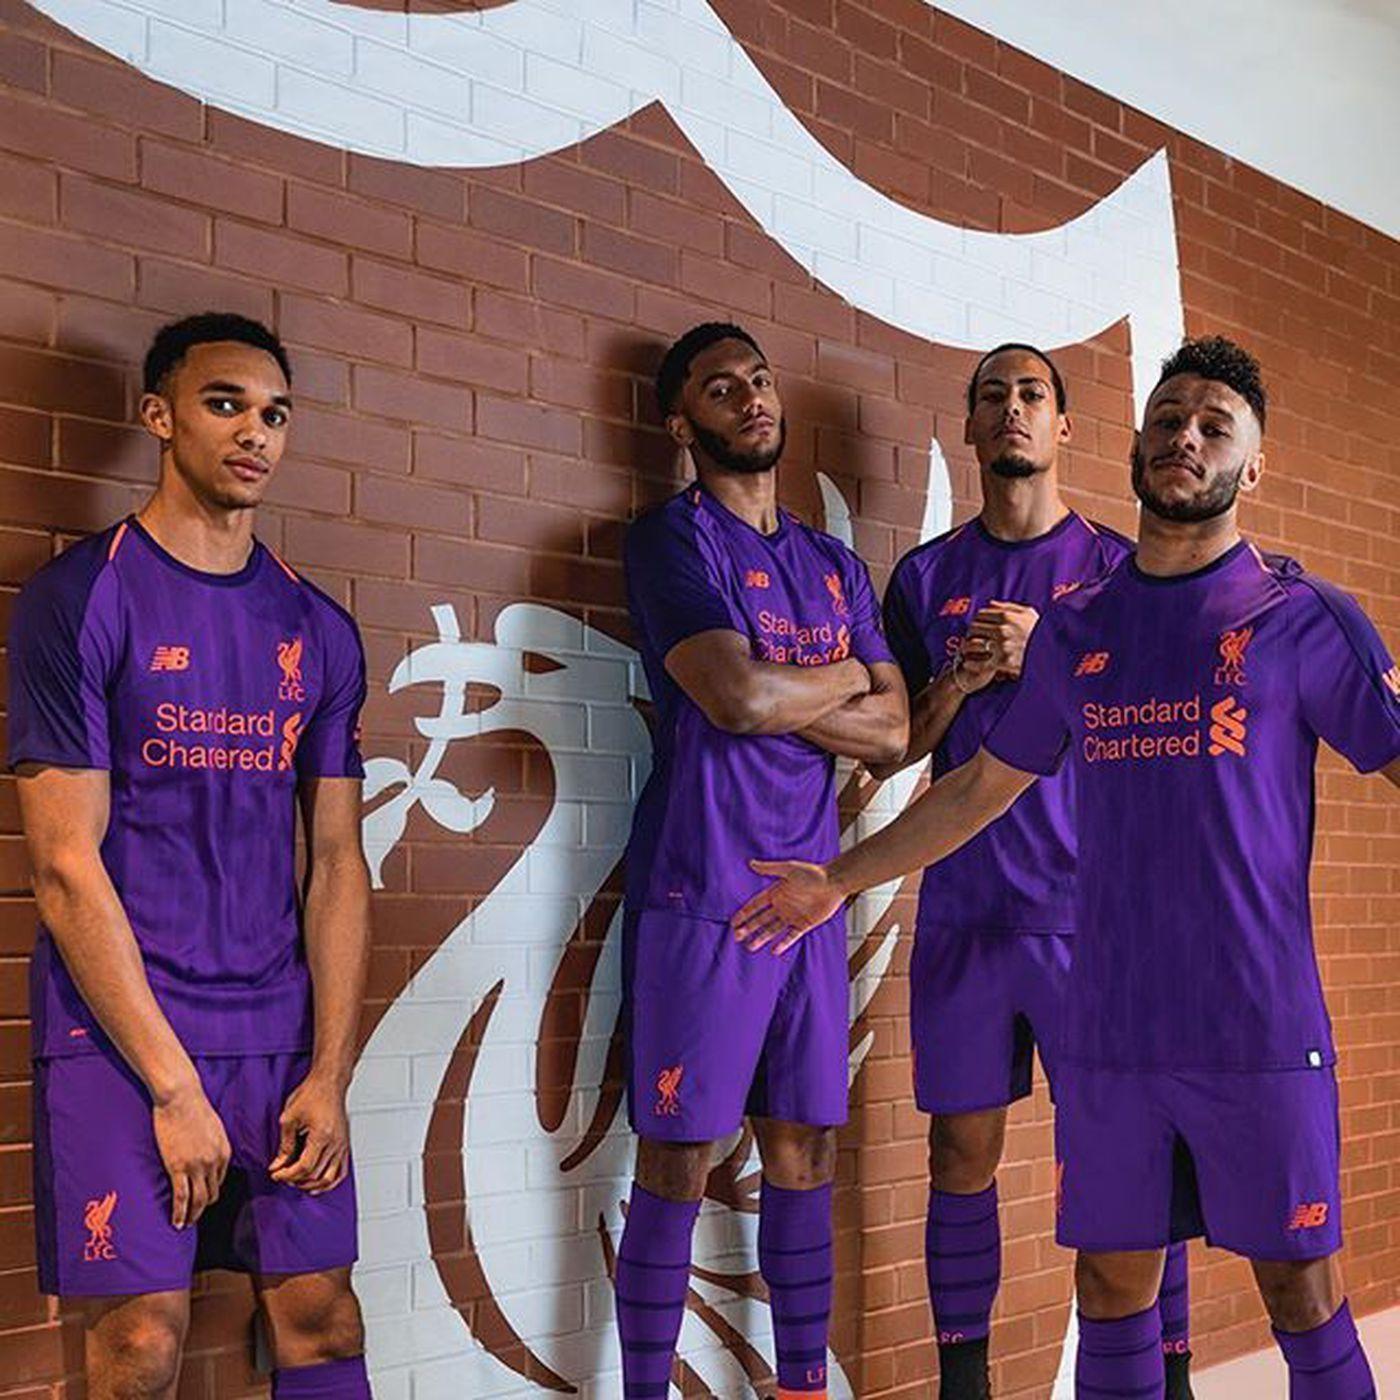 promo code 641d7 0cf10 Pin by Pryaa hansraj on liverpool | Liverpool kit, Liverpool ...